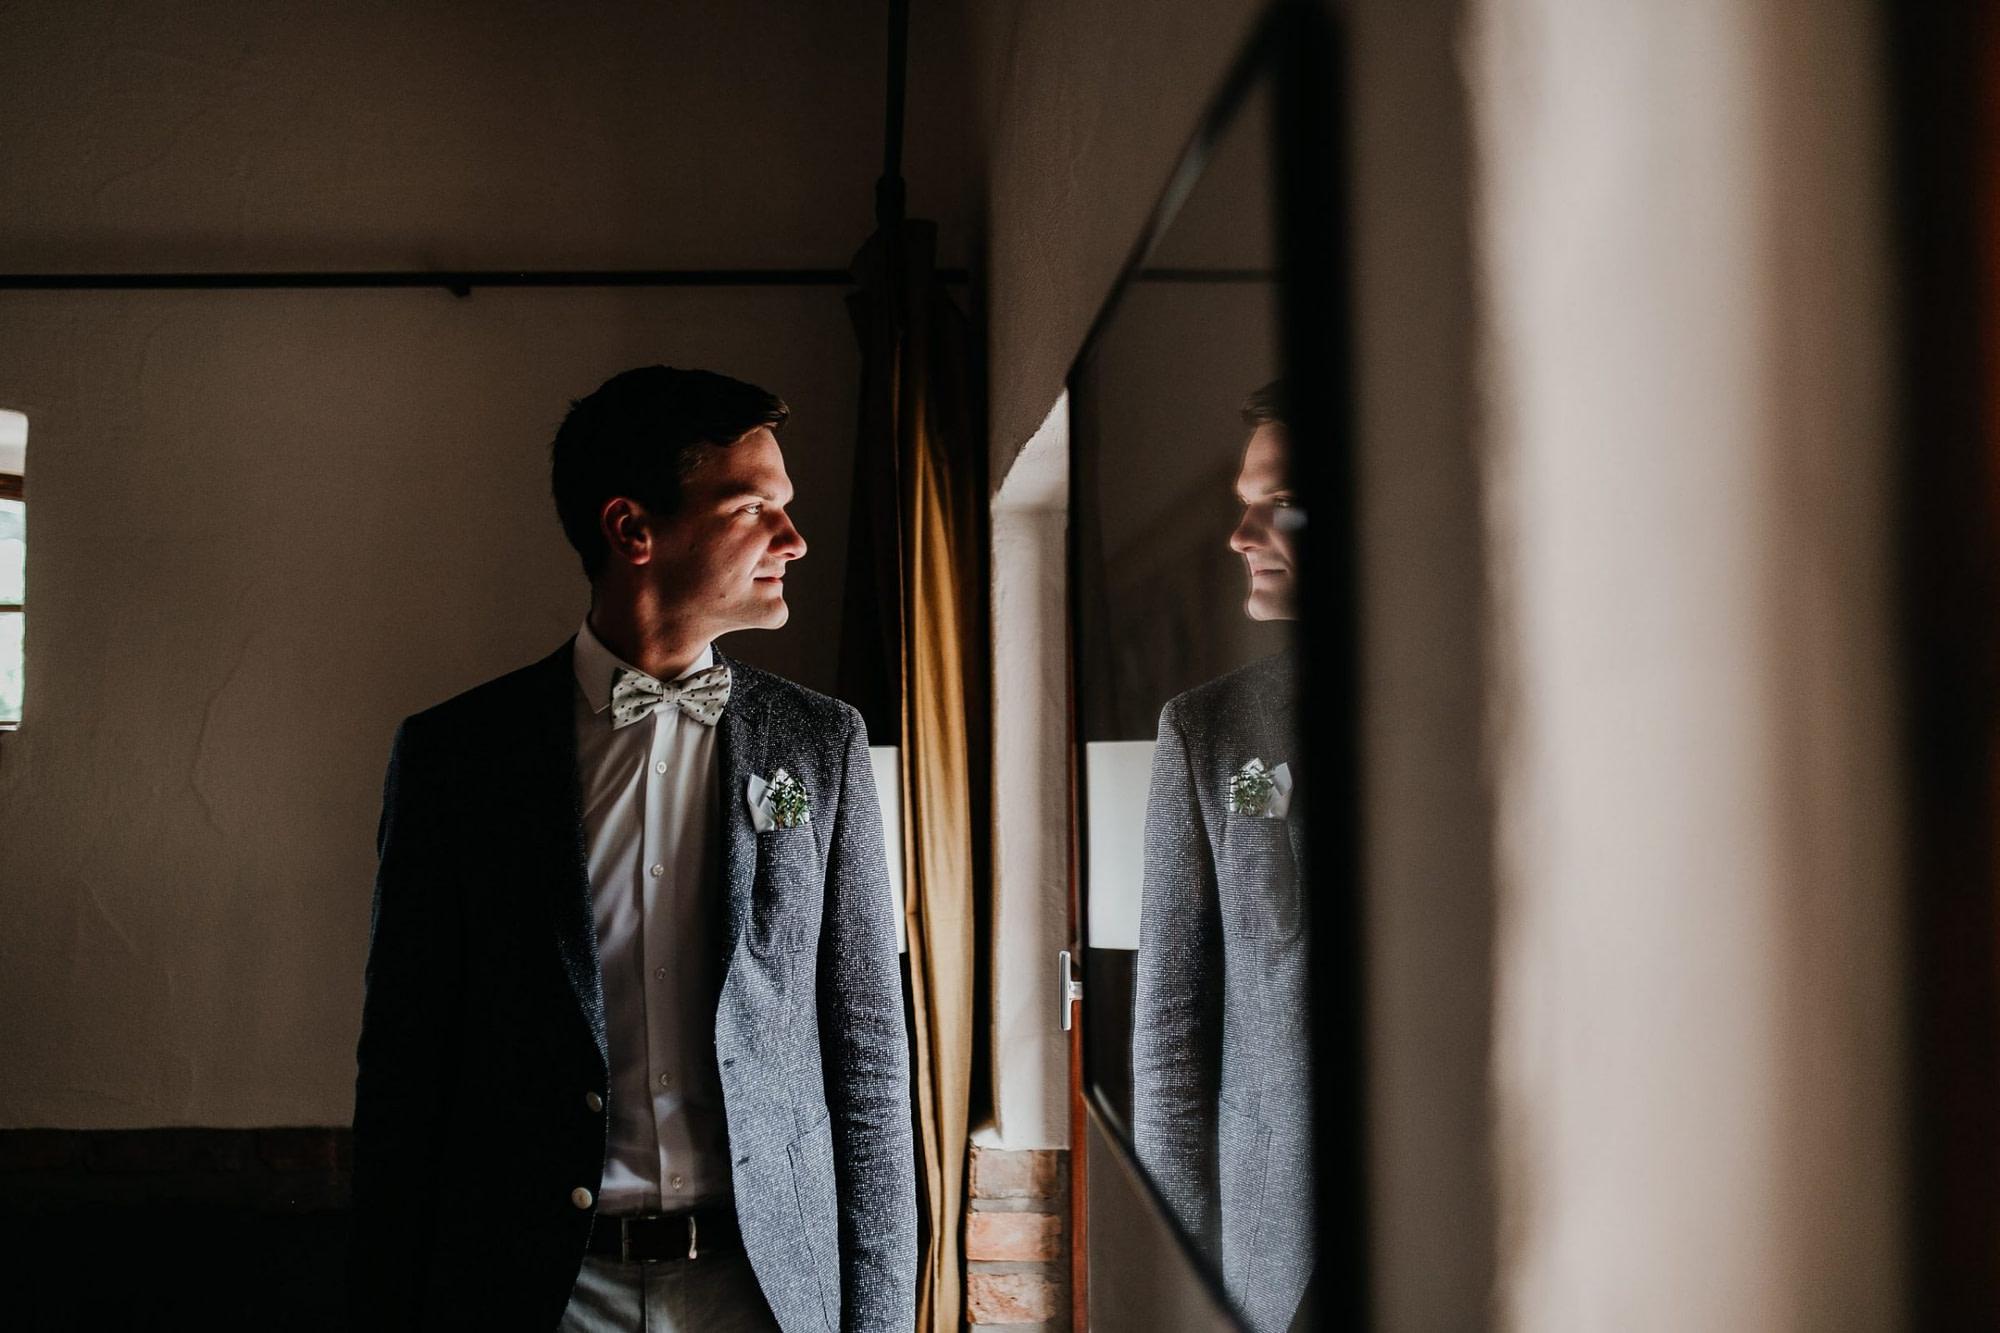 getting ready, groom getting ready, suit, bow tie, fliege, anzug